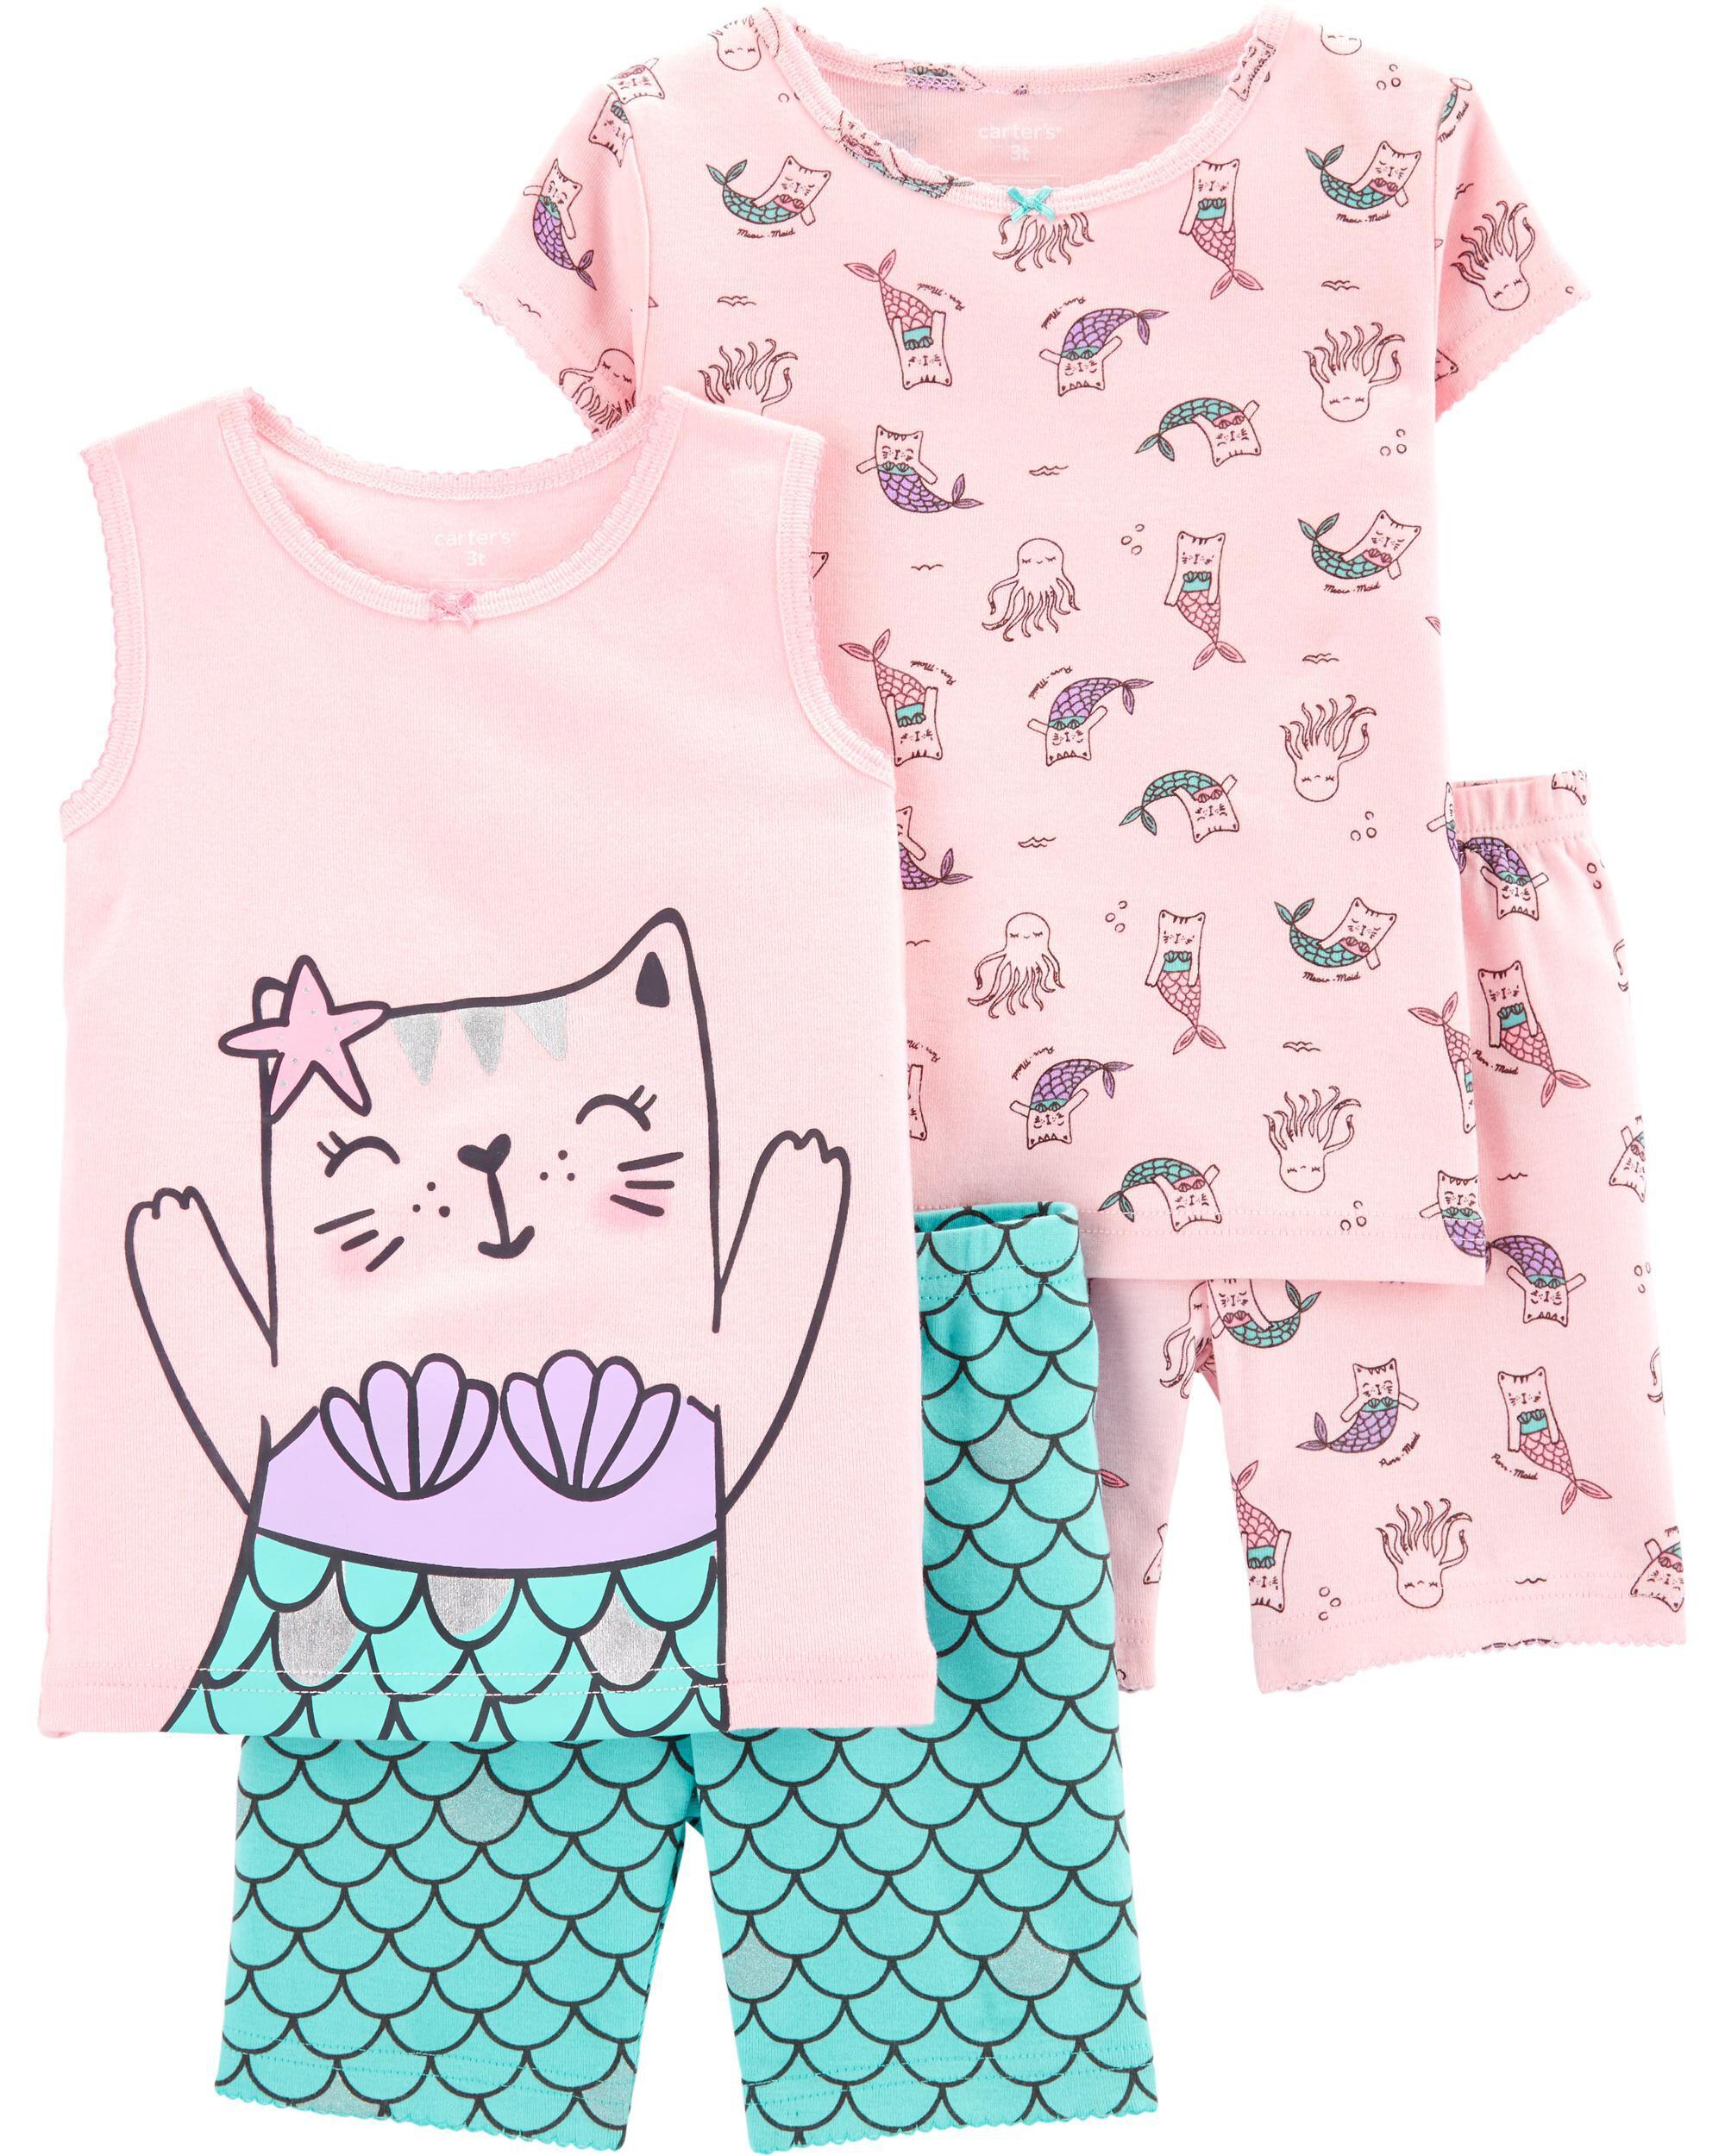 *CLEARANCE* 4-Piece Cat Mermaid Snug Fit Cotton PJs